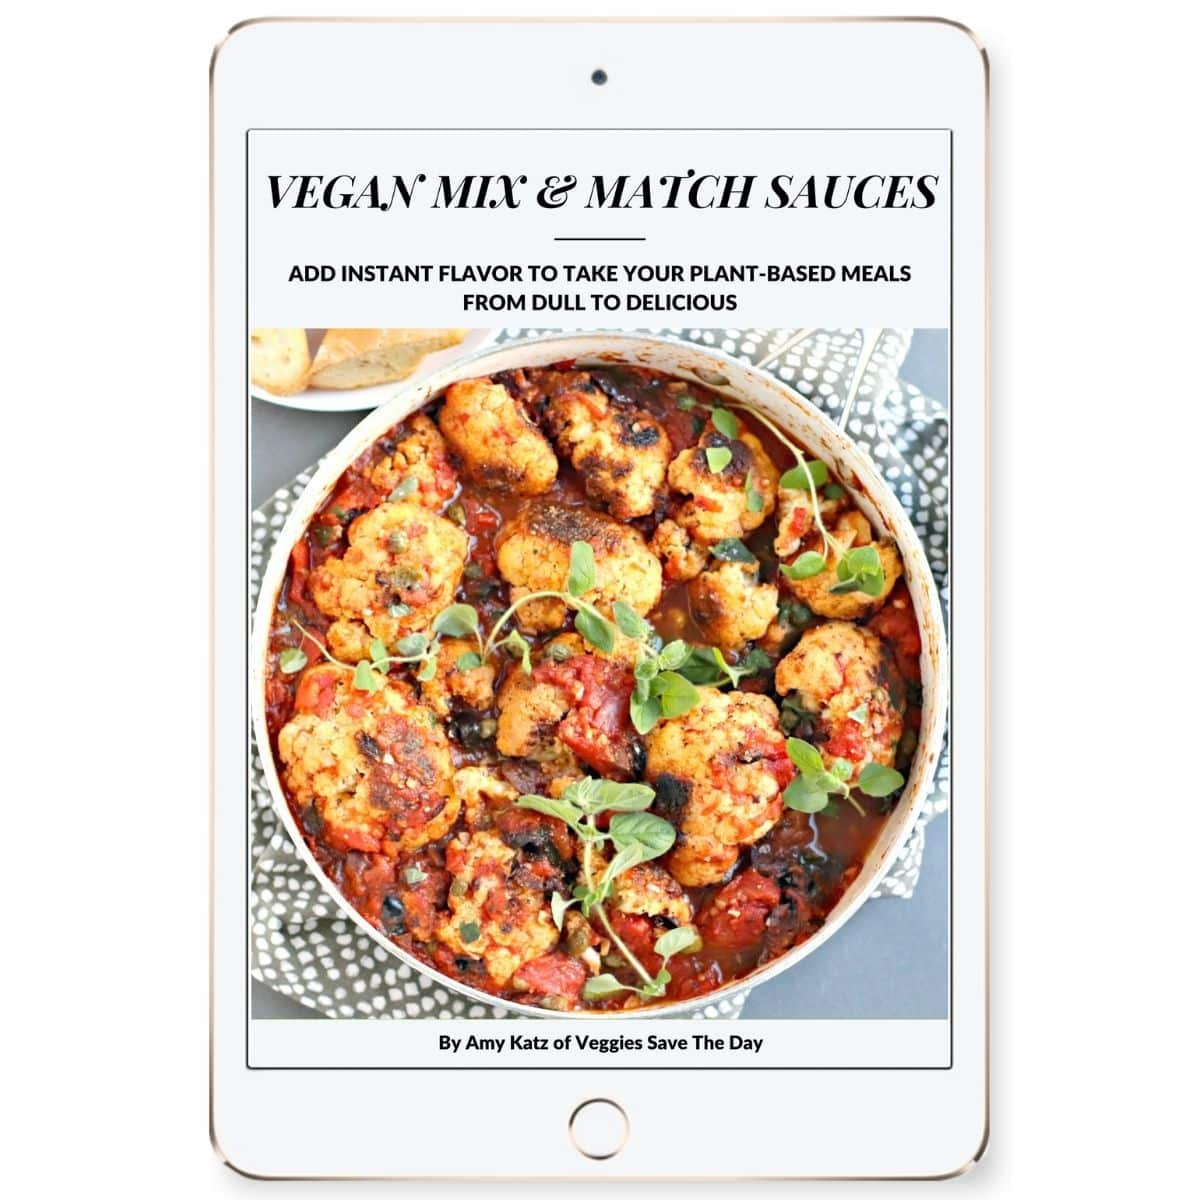 Vegan Mix & Match Sauces eBook cover on a tablet